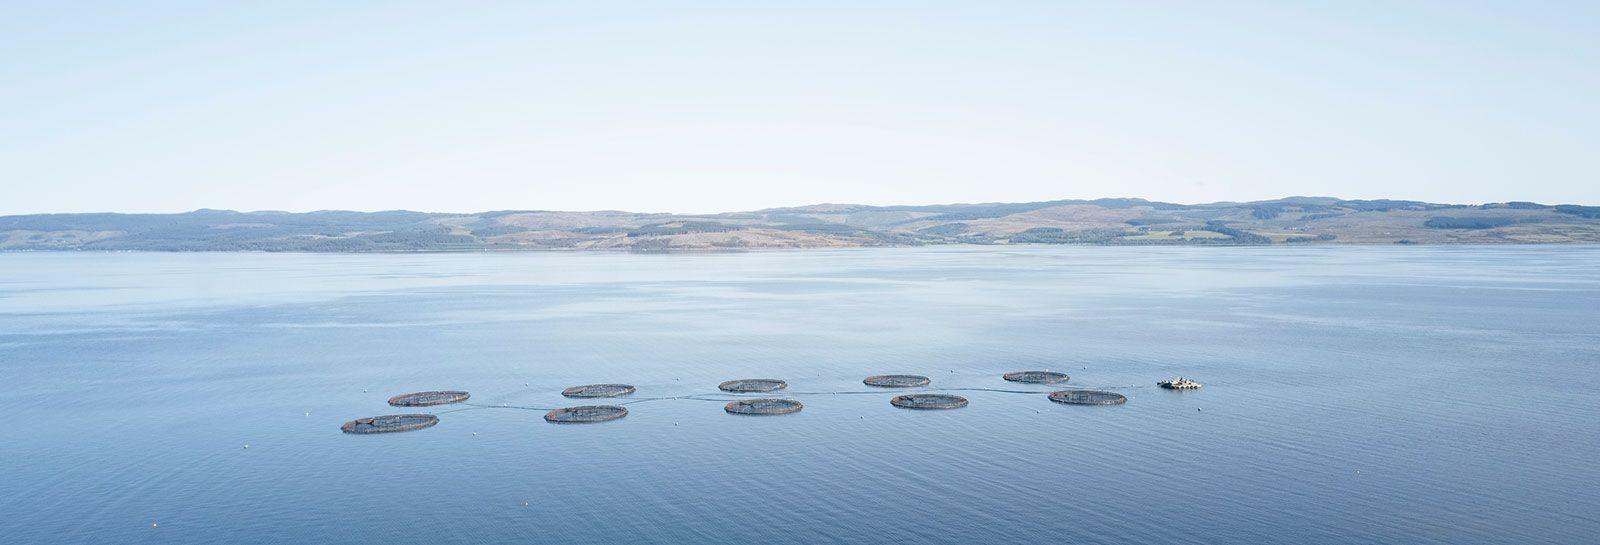 Fish farm at Loch Awe banner image